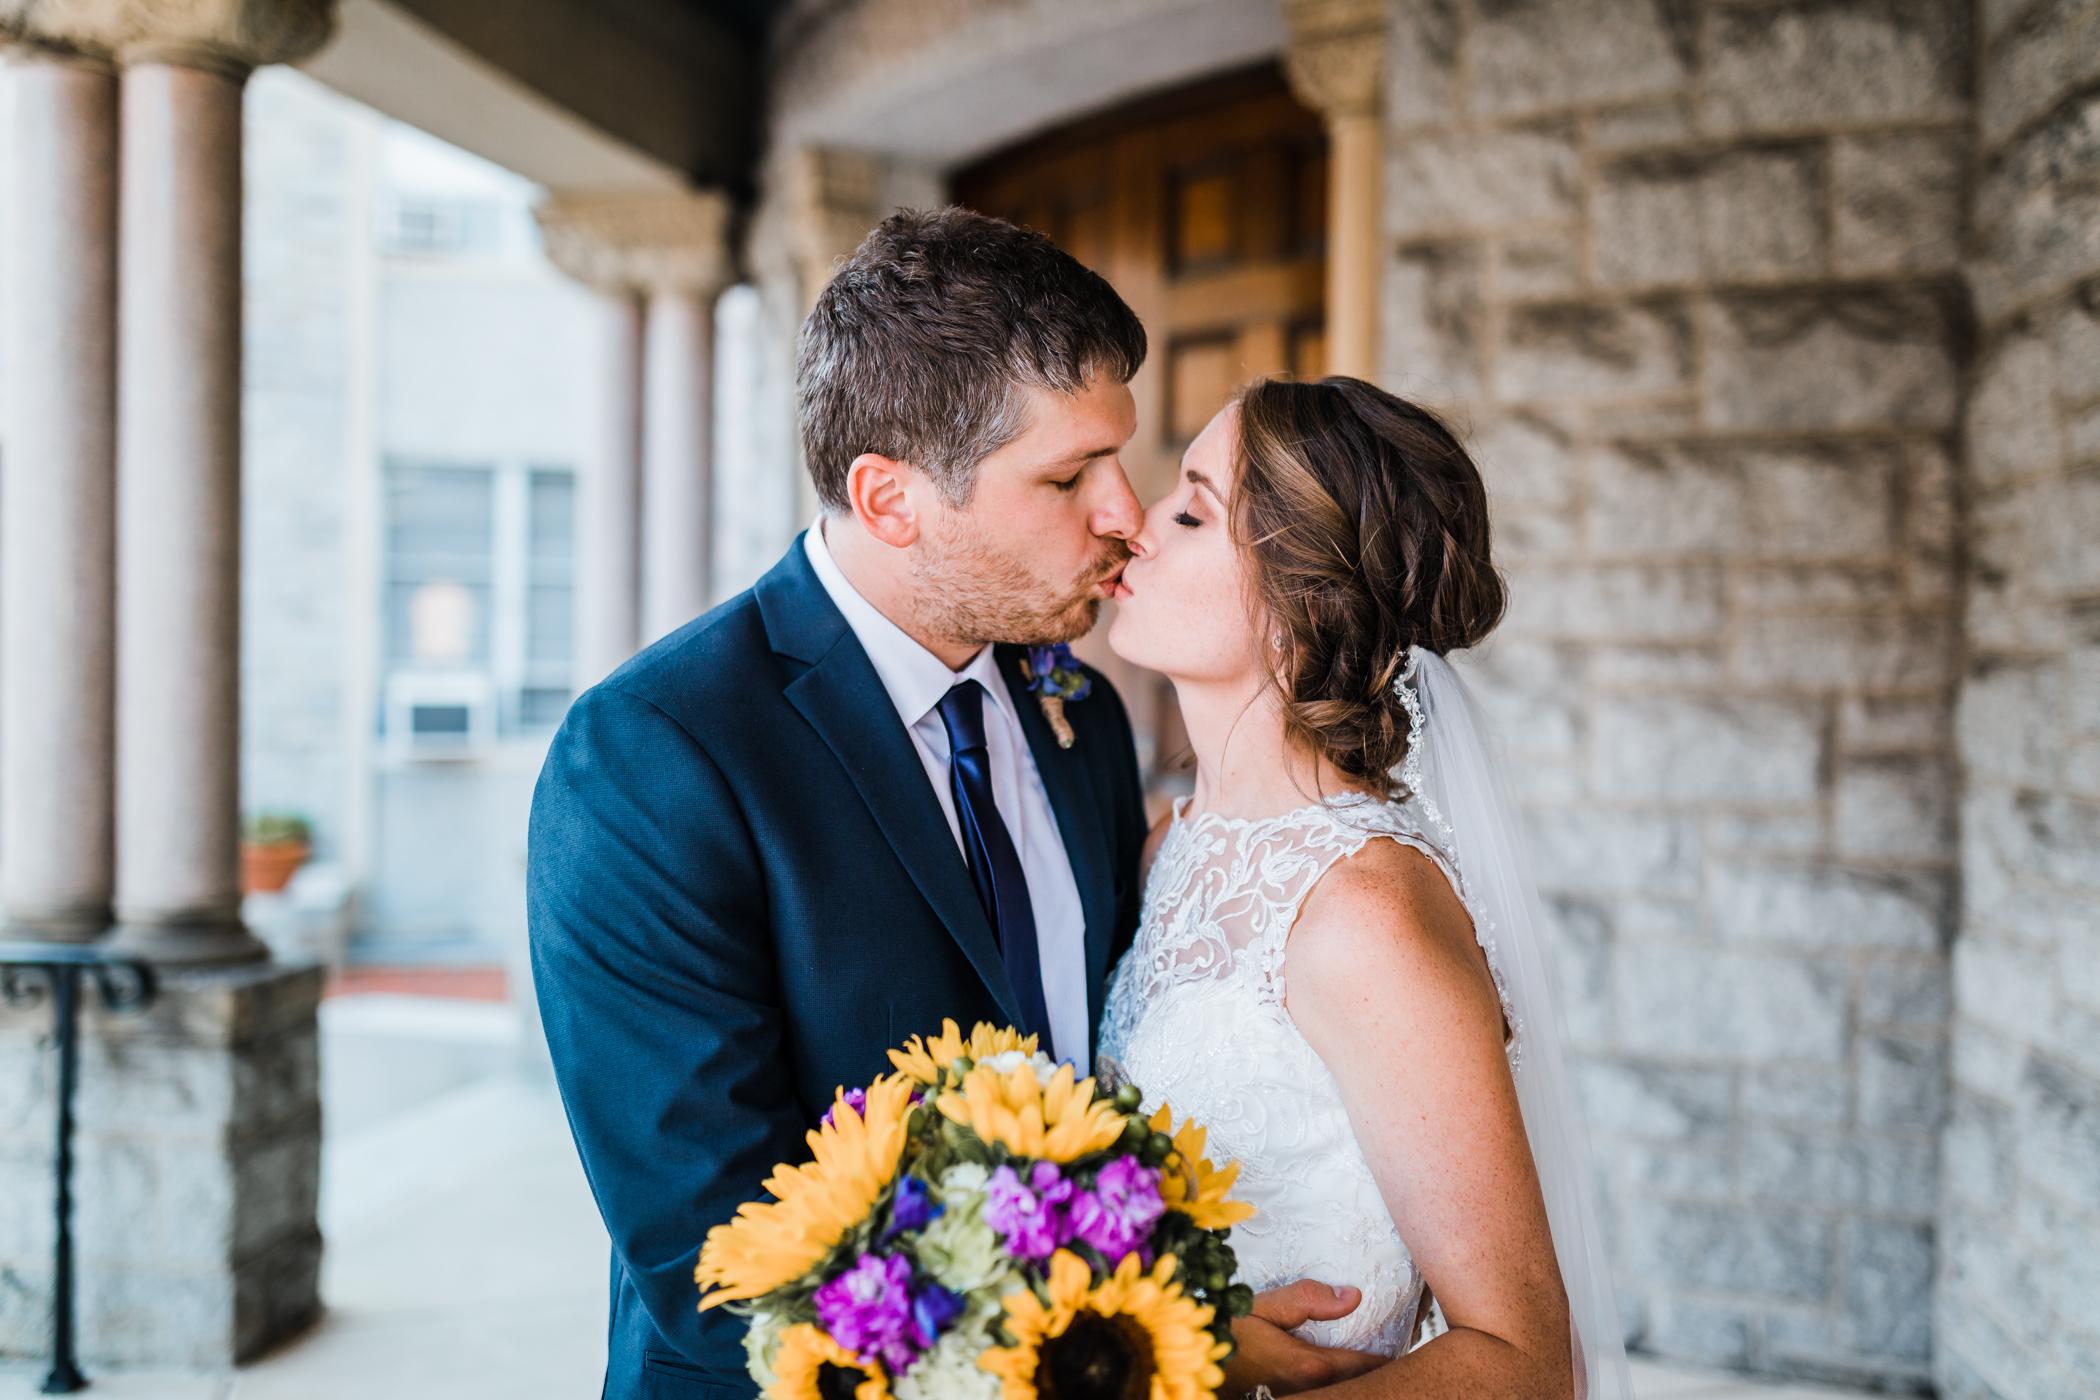 greek orthodox wedding in baltimore maryland - best maryland wedding photographer - husband and wife team